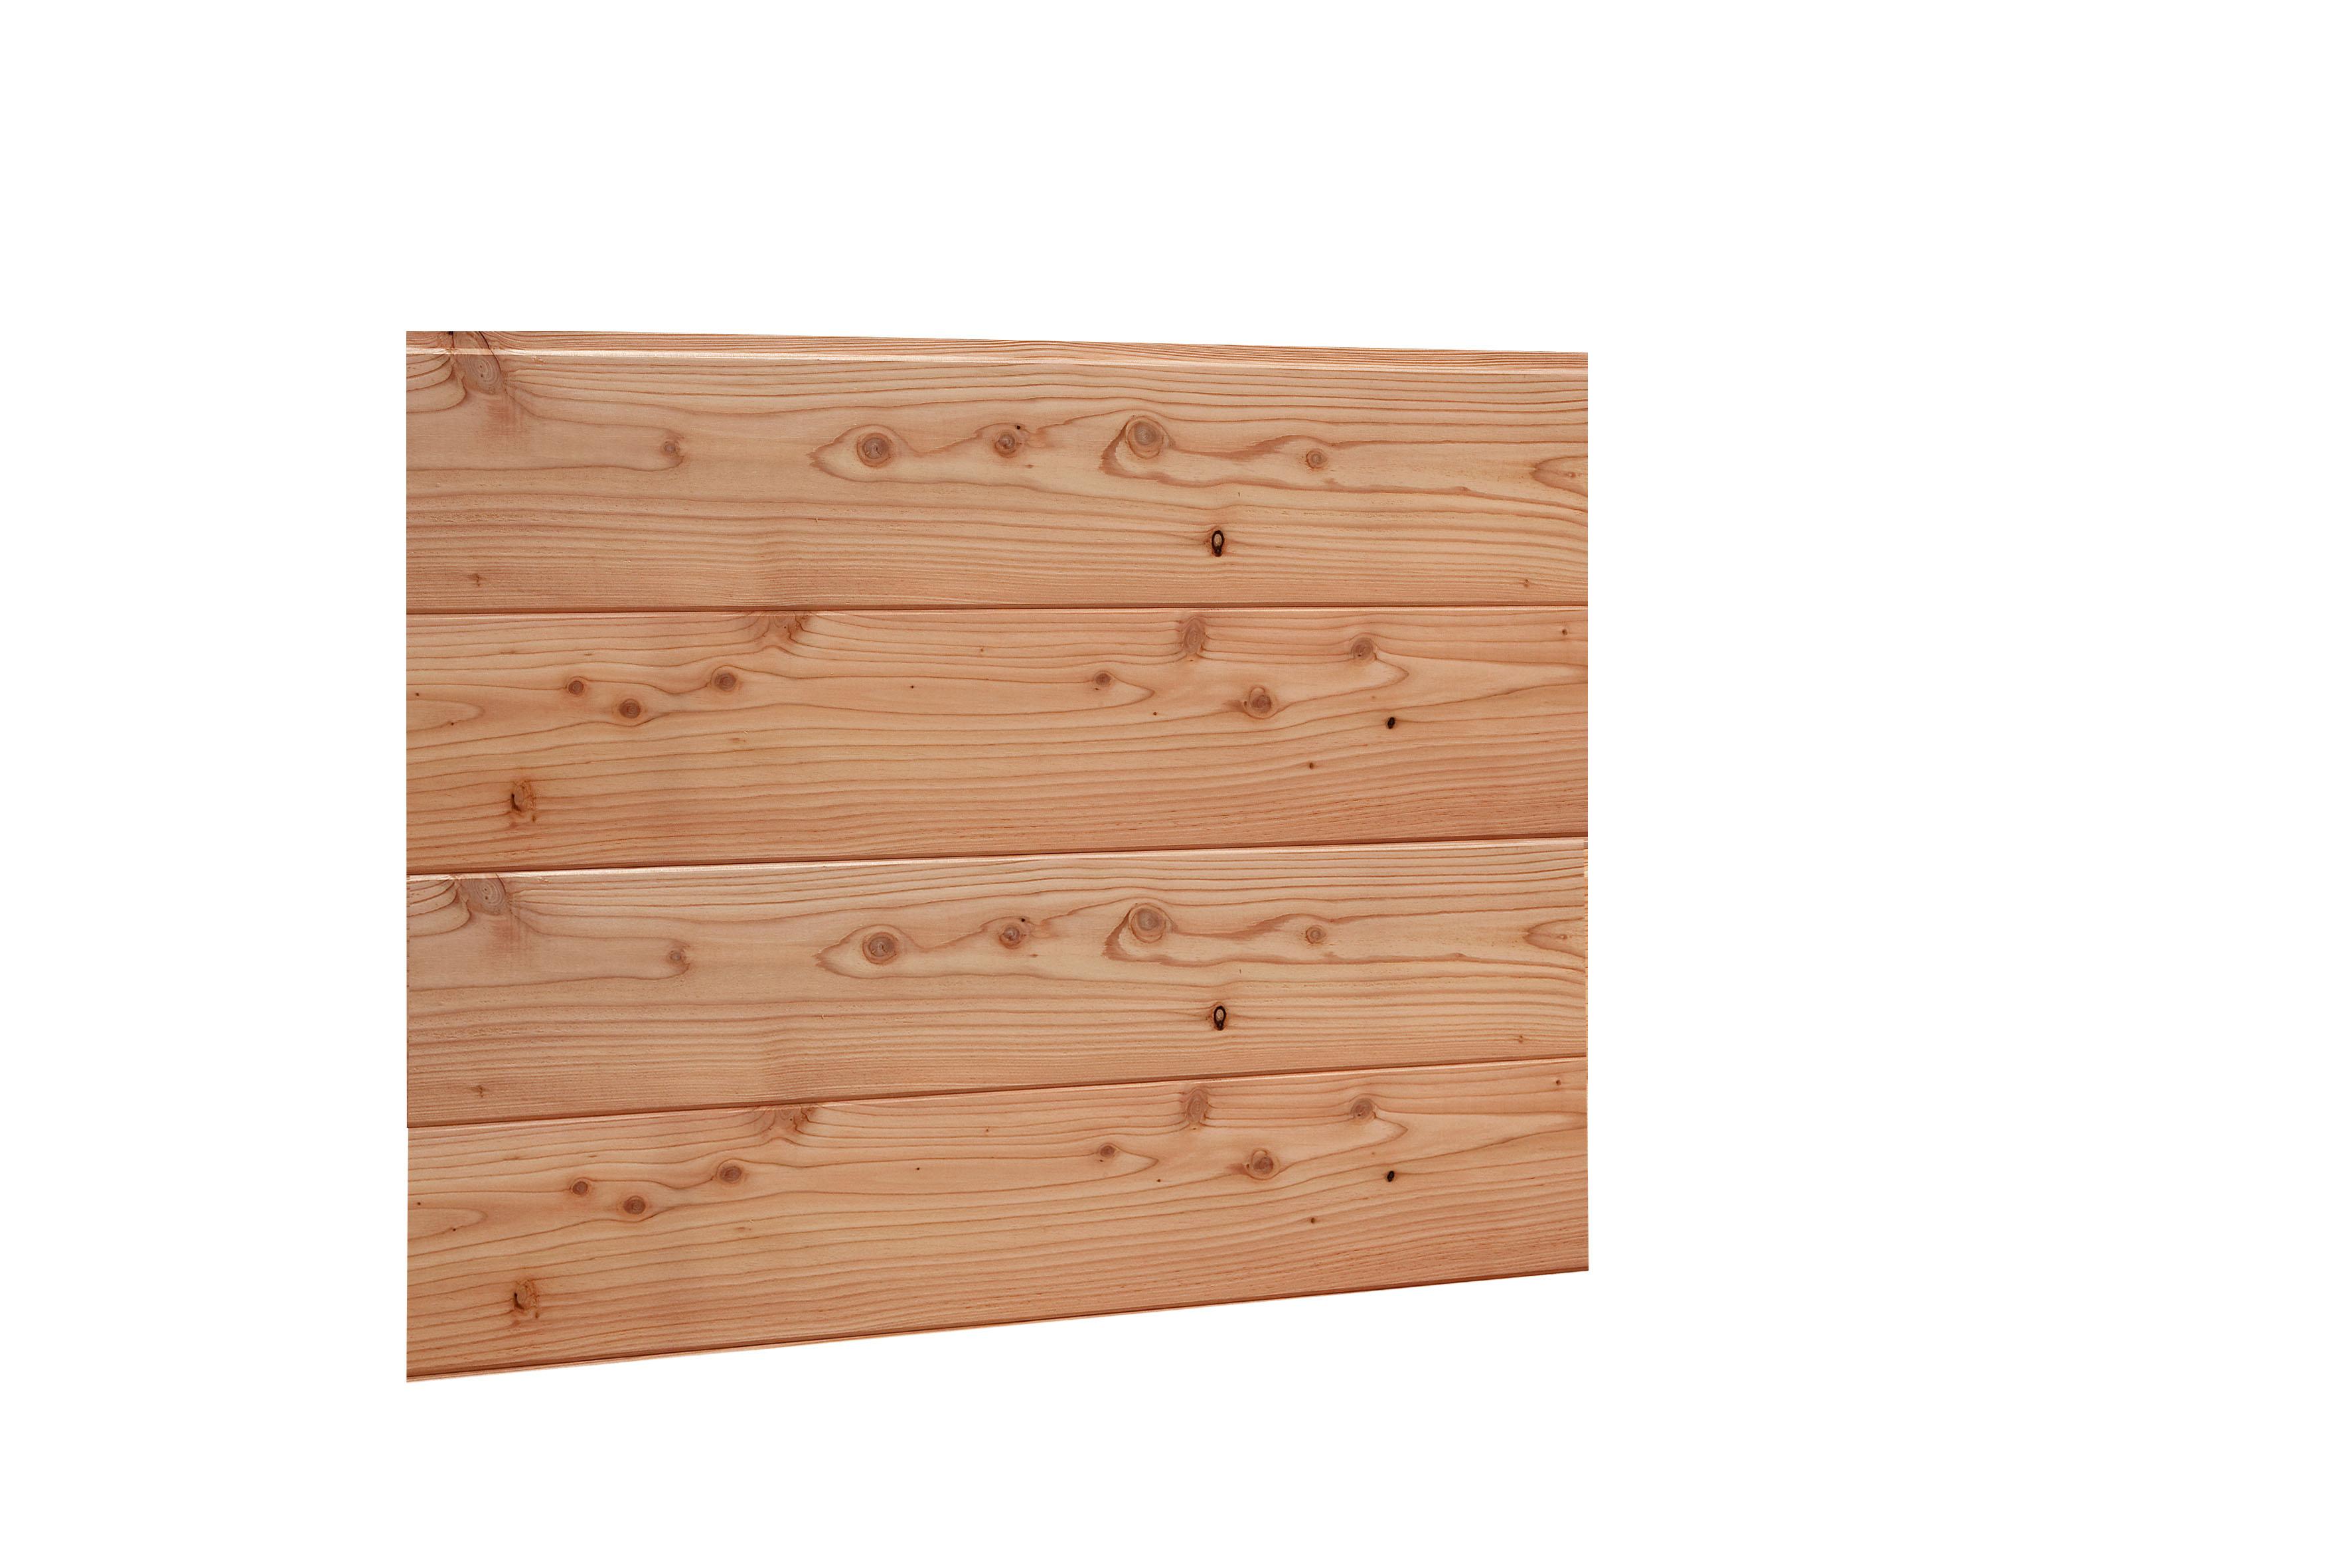 Douglasvision | Blokhutprofiel | Wand F 228,5 x 294 cm | Enkele Deur | Bruin gespoten